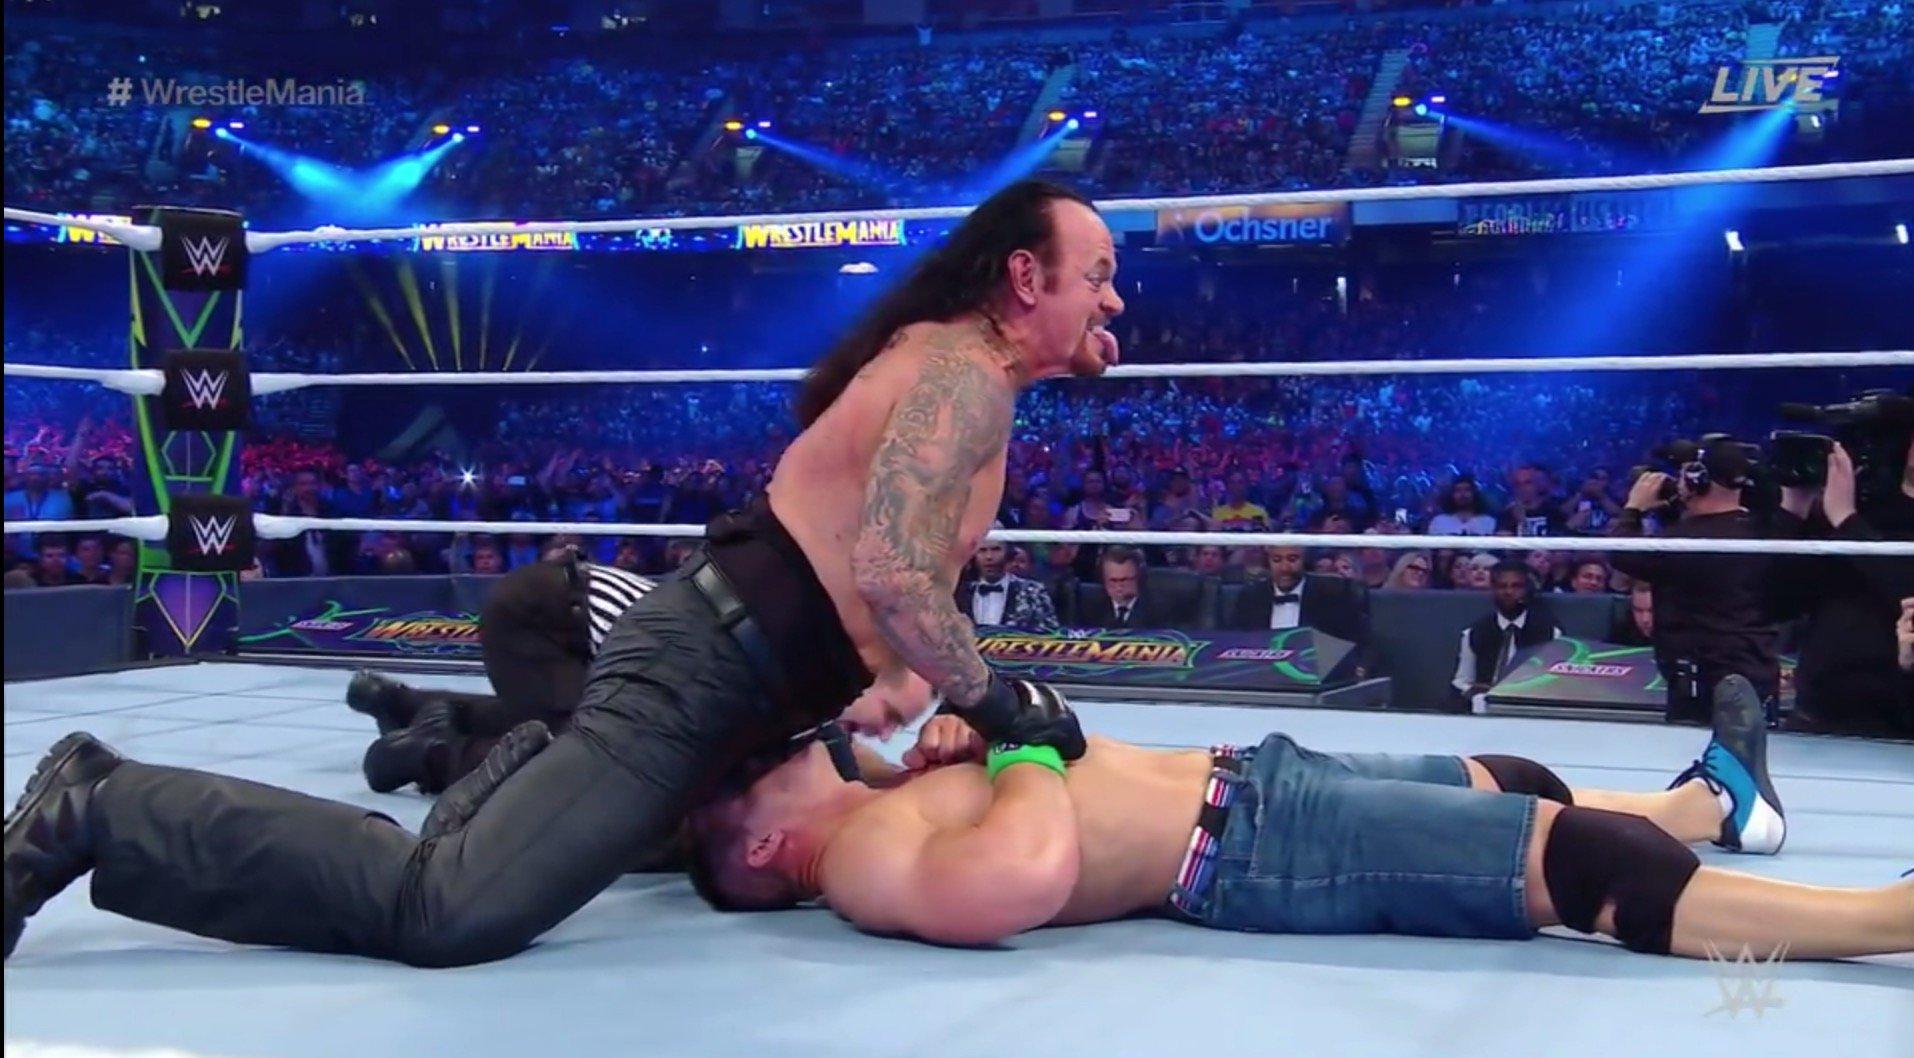 WOW.   Undertaker defeated John Cena at #WrestleMania https://t.co/0J36P6sm0t